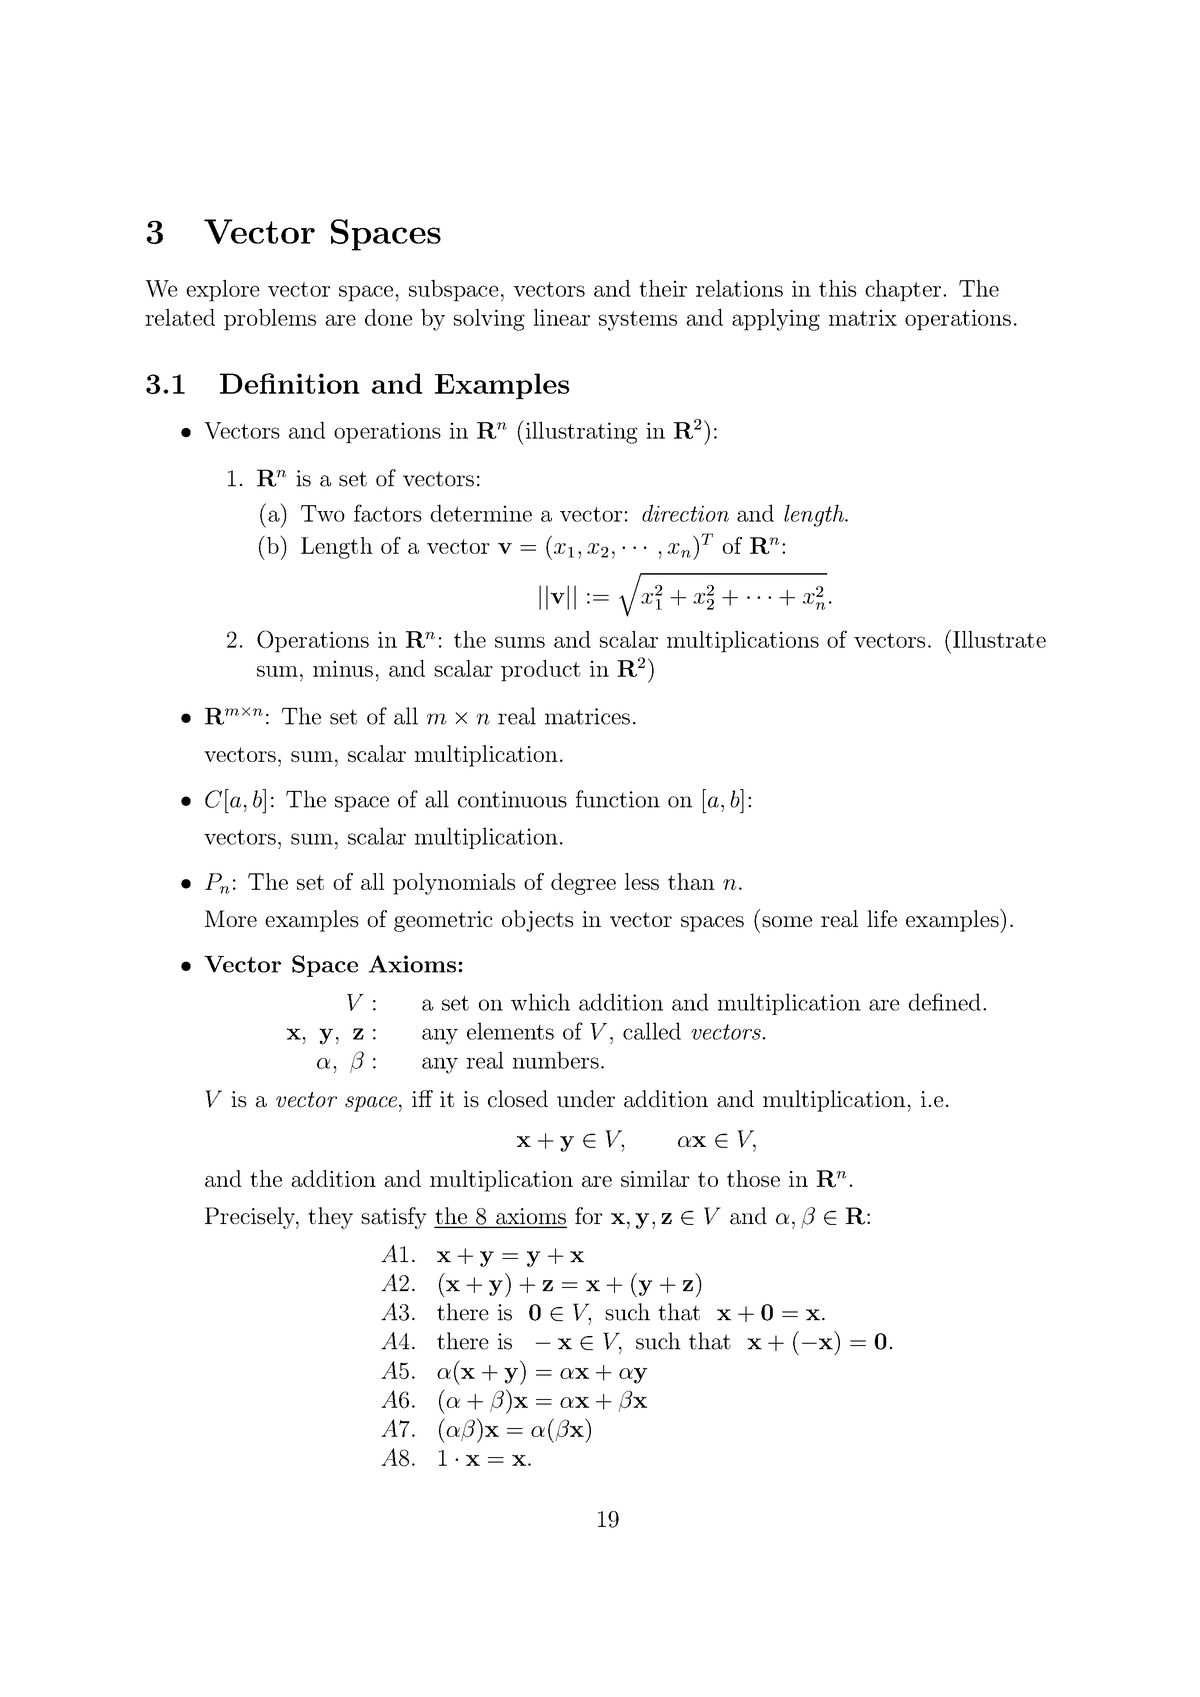 Linear Algebra-Chapter 3 - MATH 304: Linear Algebra - StuDocu